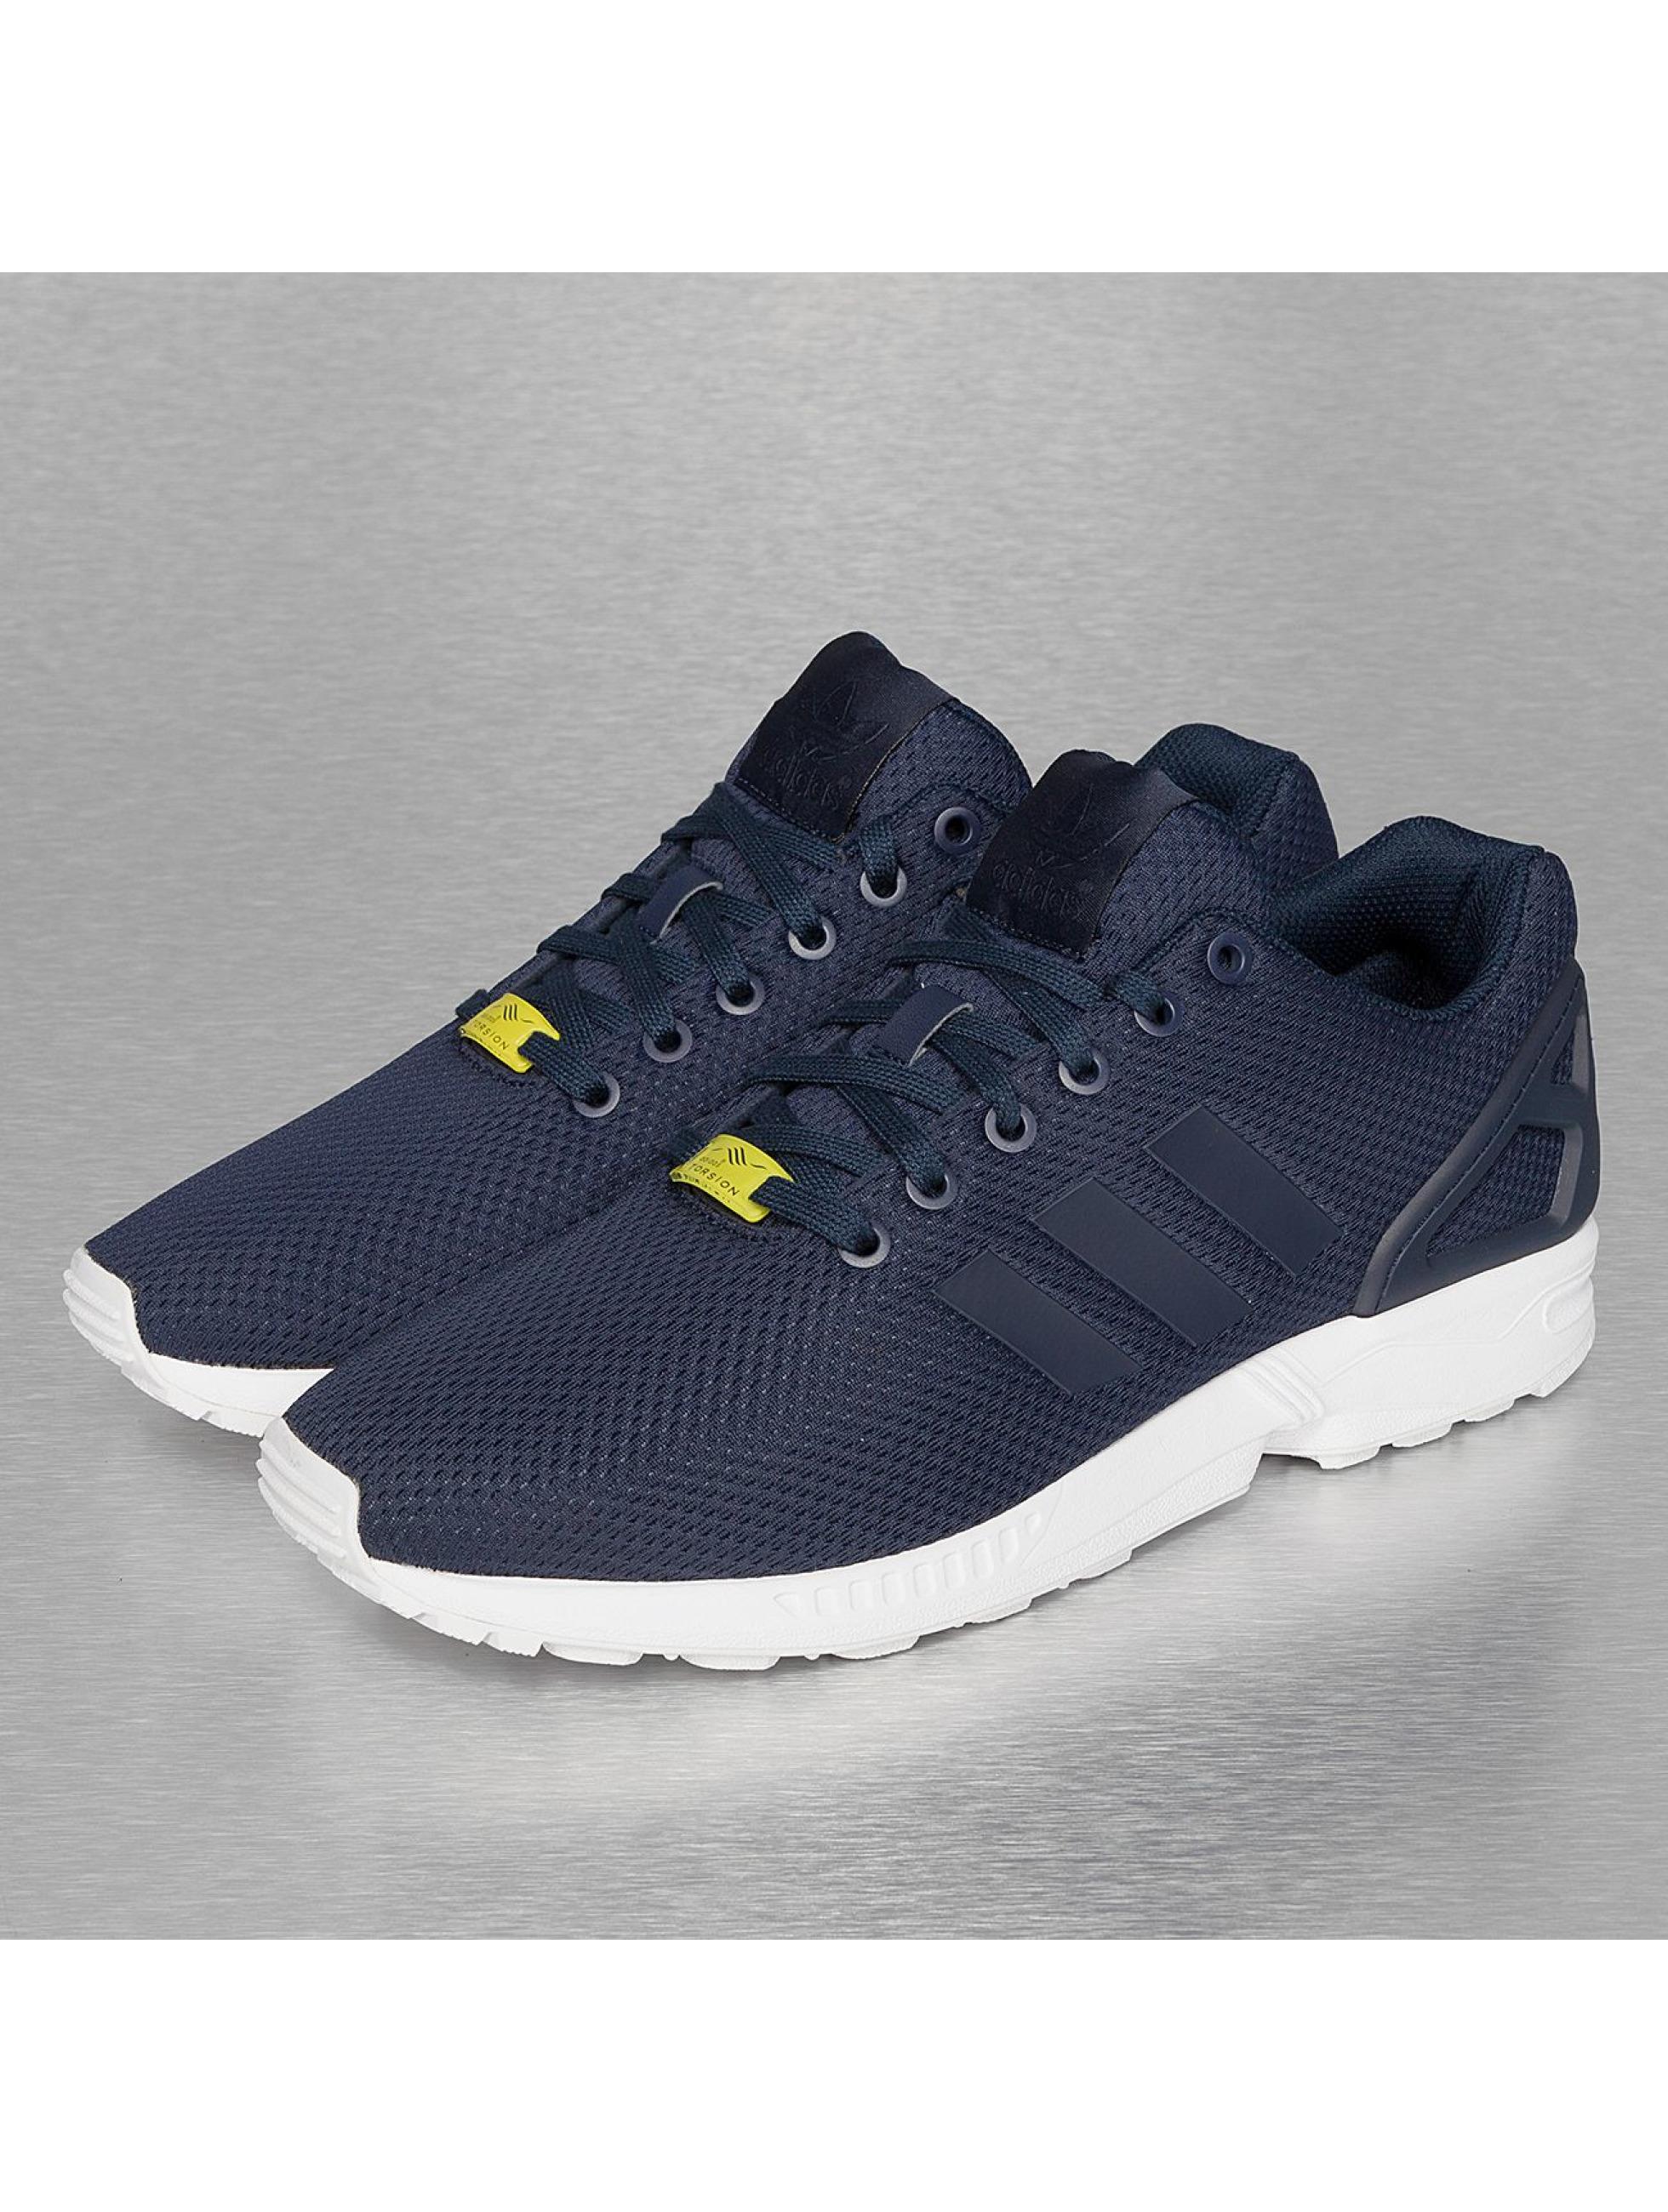 Adidas Zx Flux Bleu Et Blanc